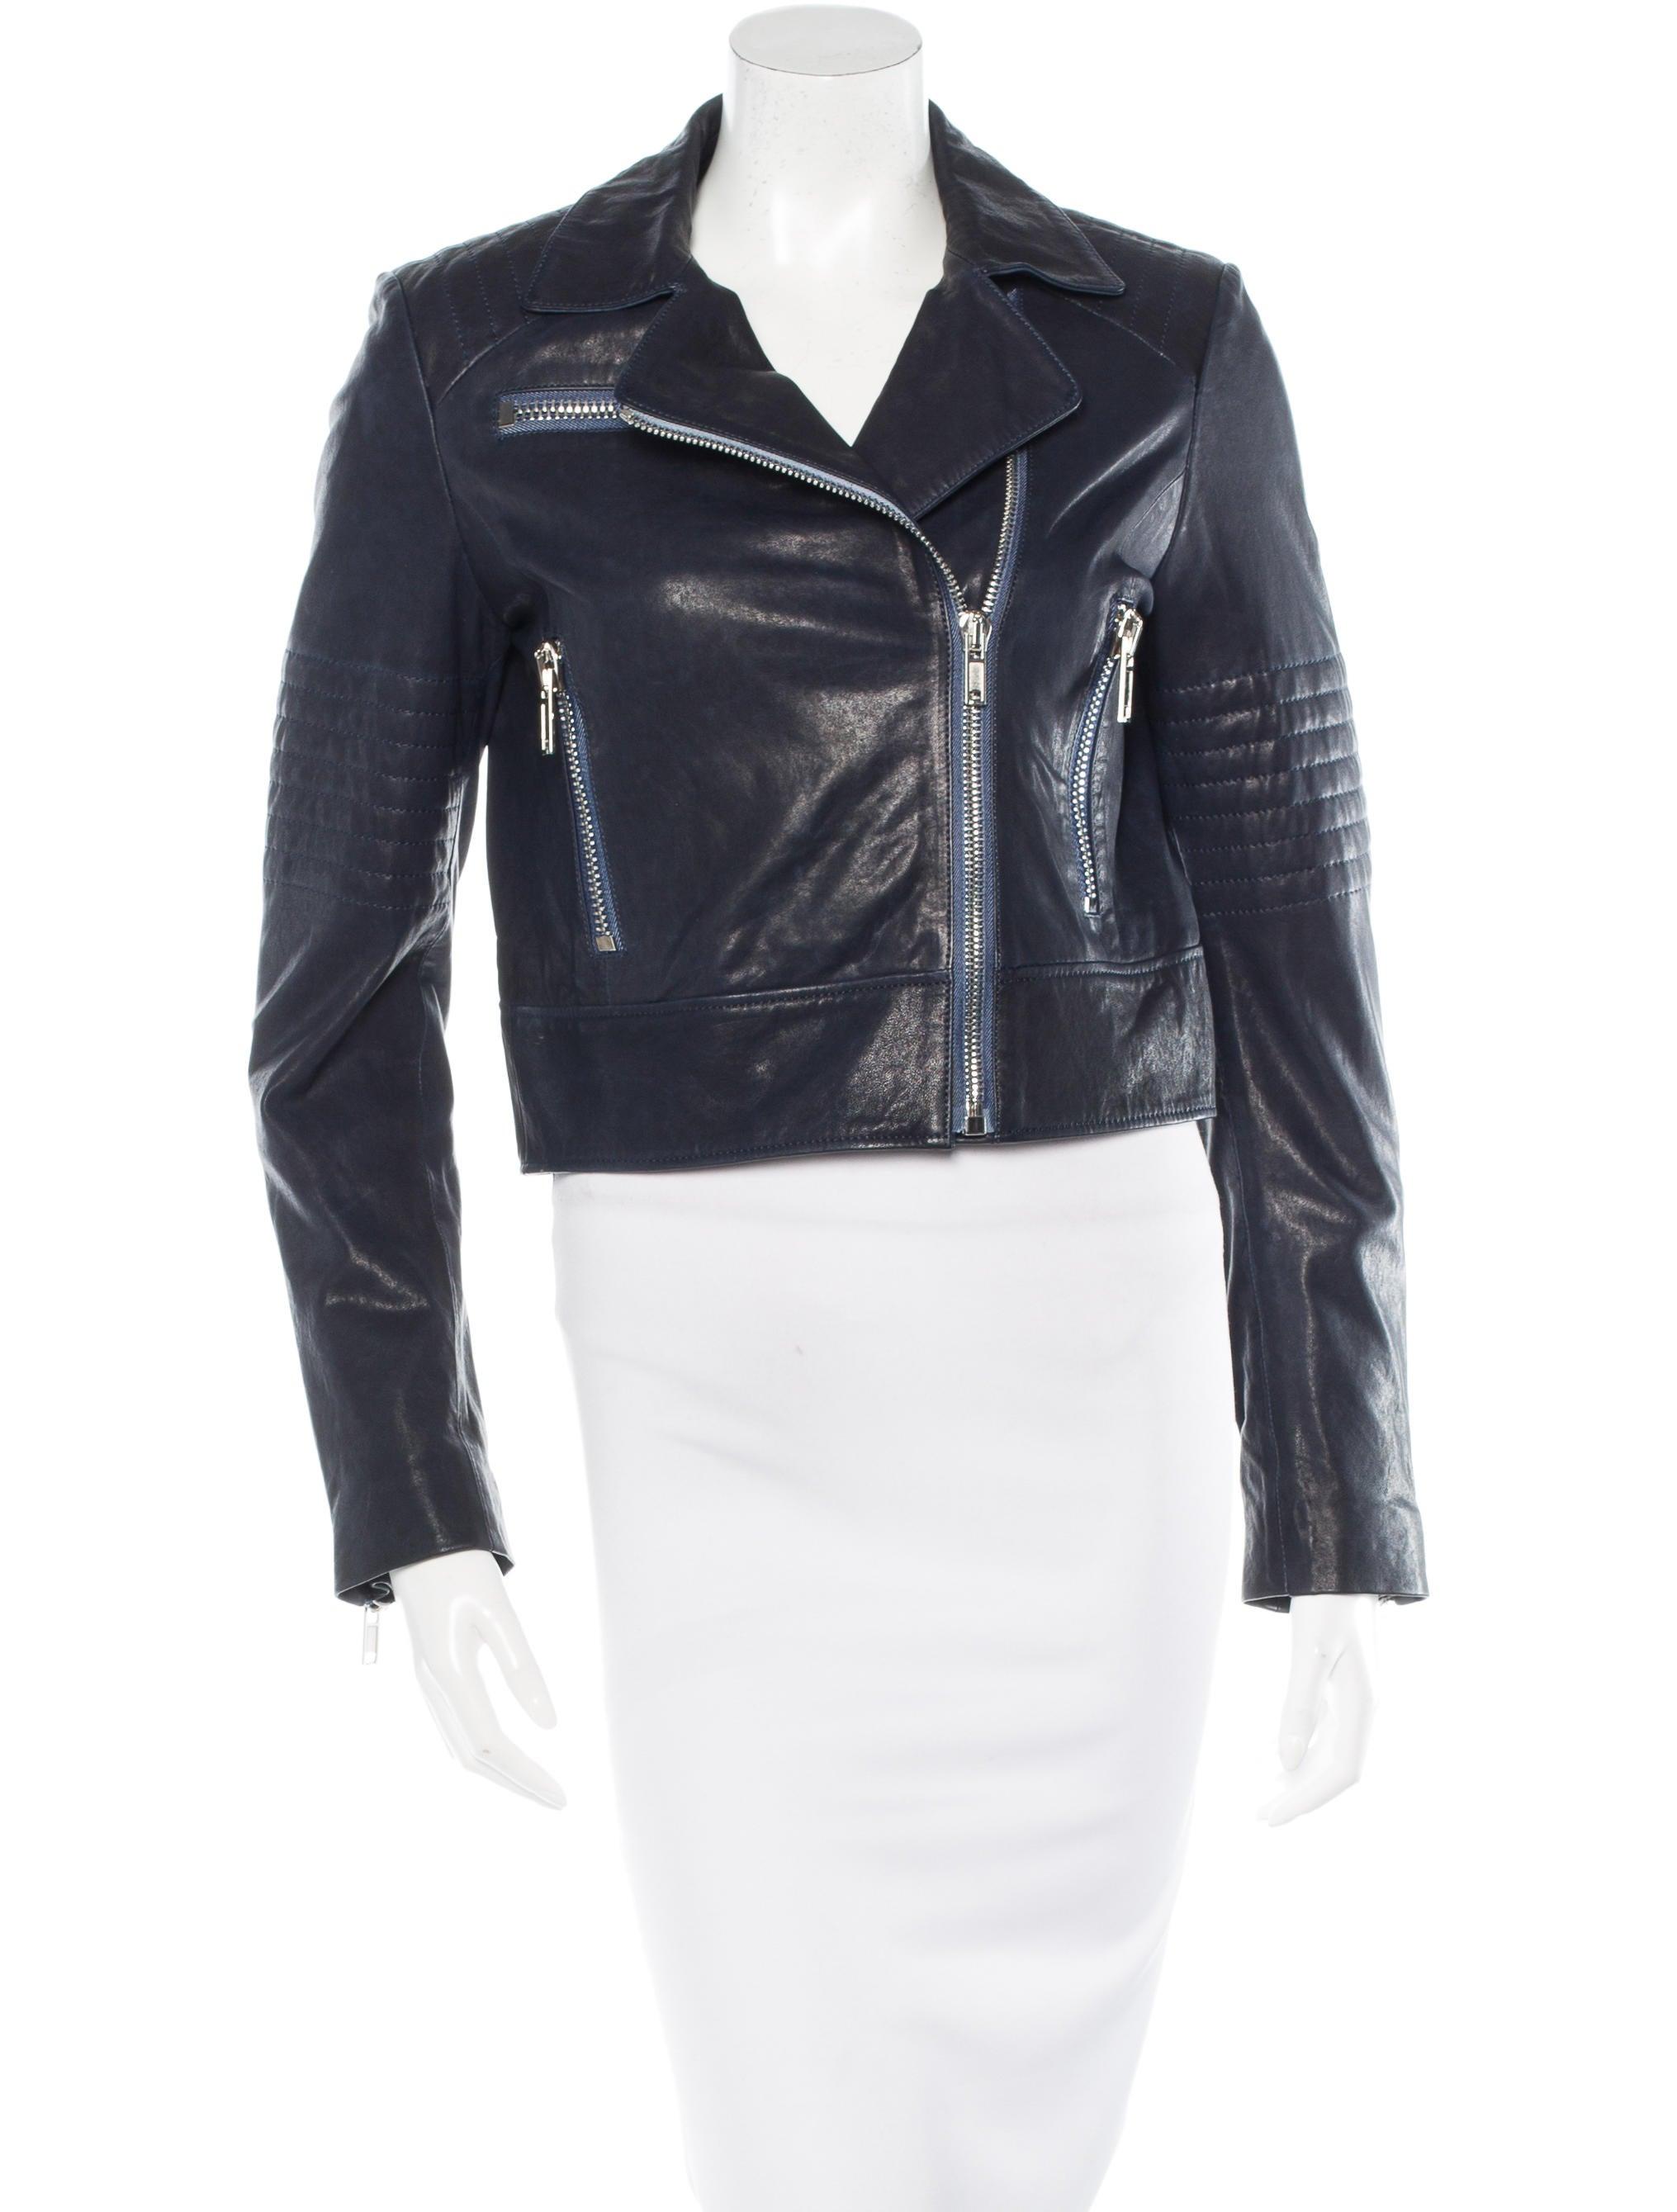 J brand leather jacket